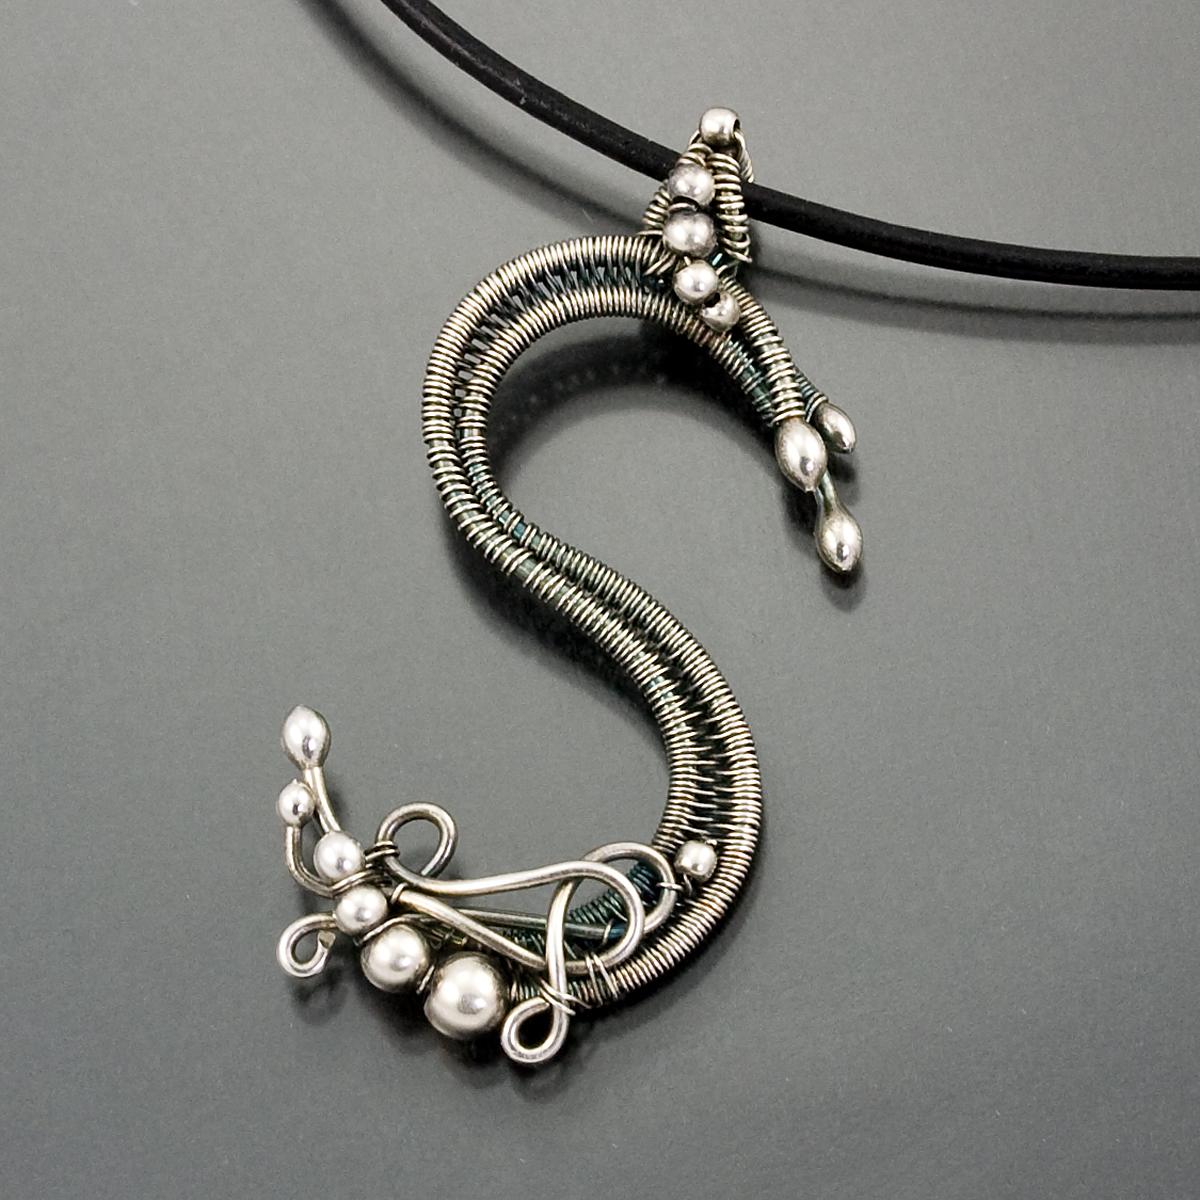 15 Initial Necklace Designs Ideas Design Trends